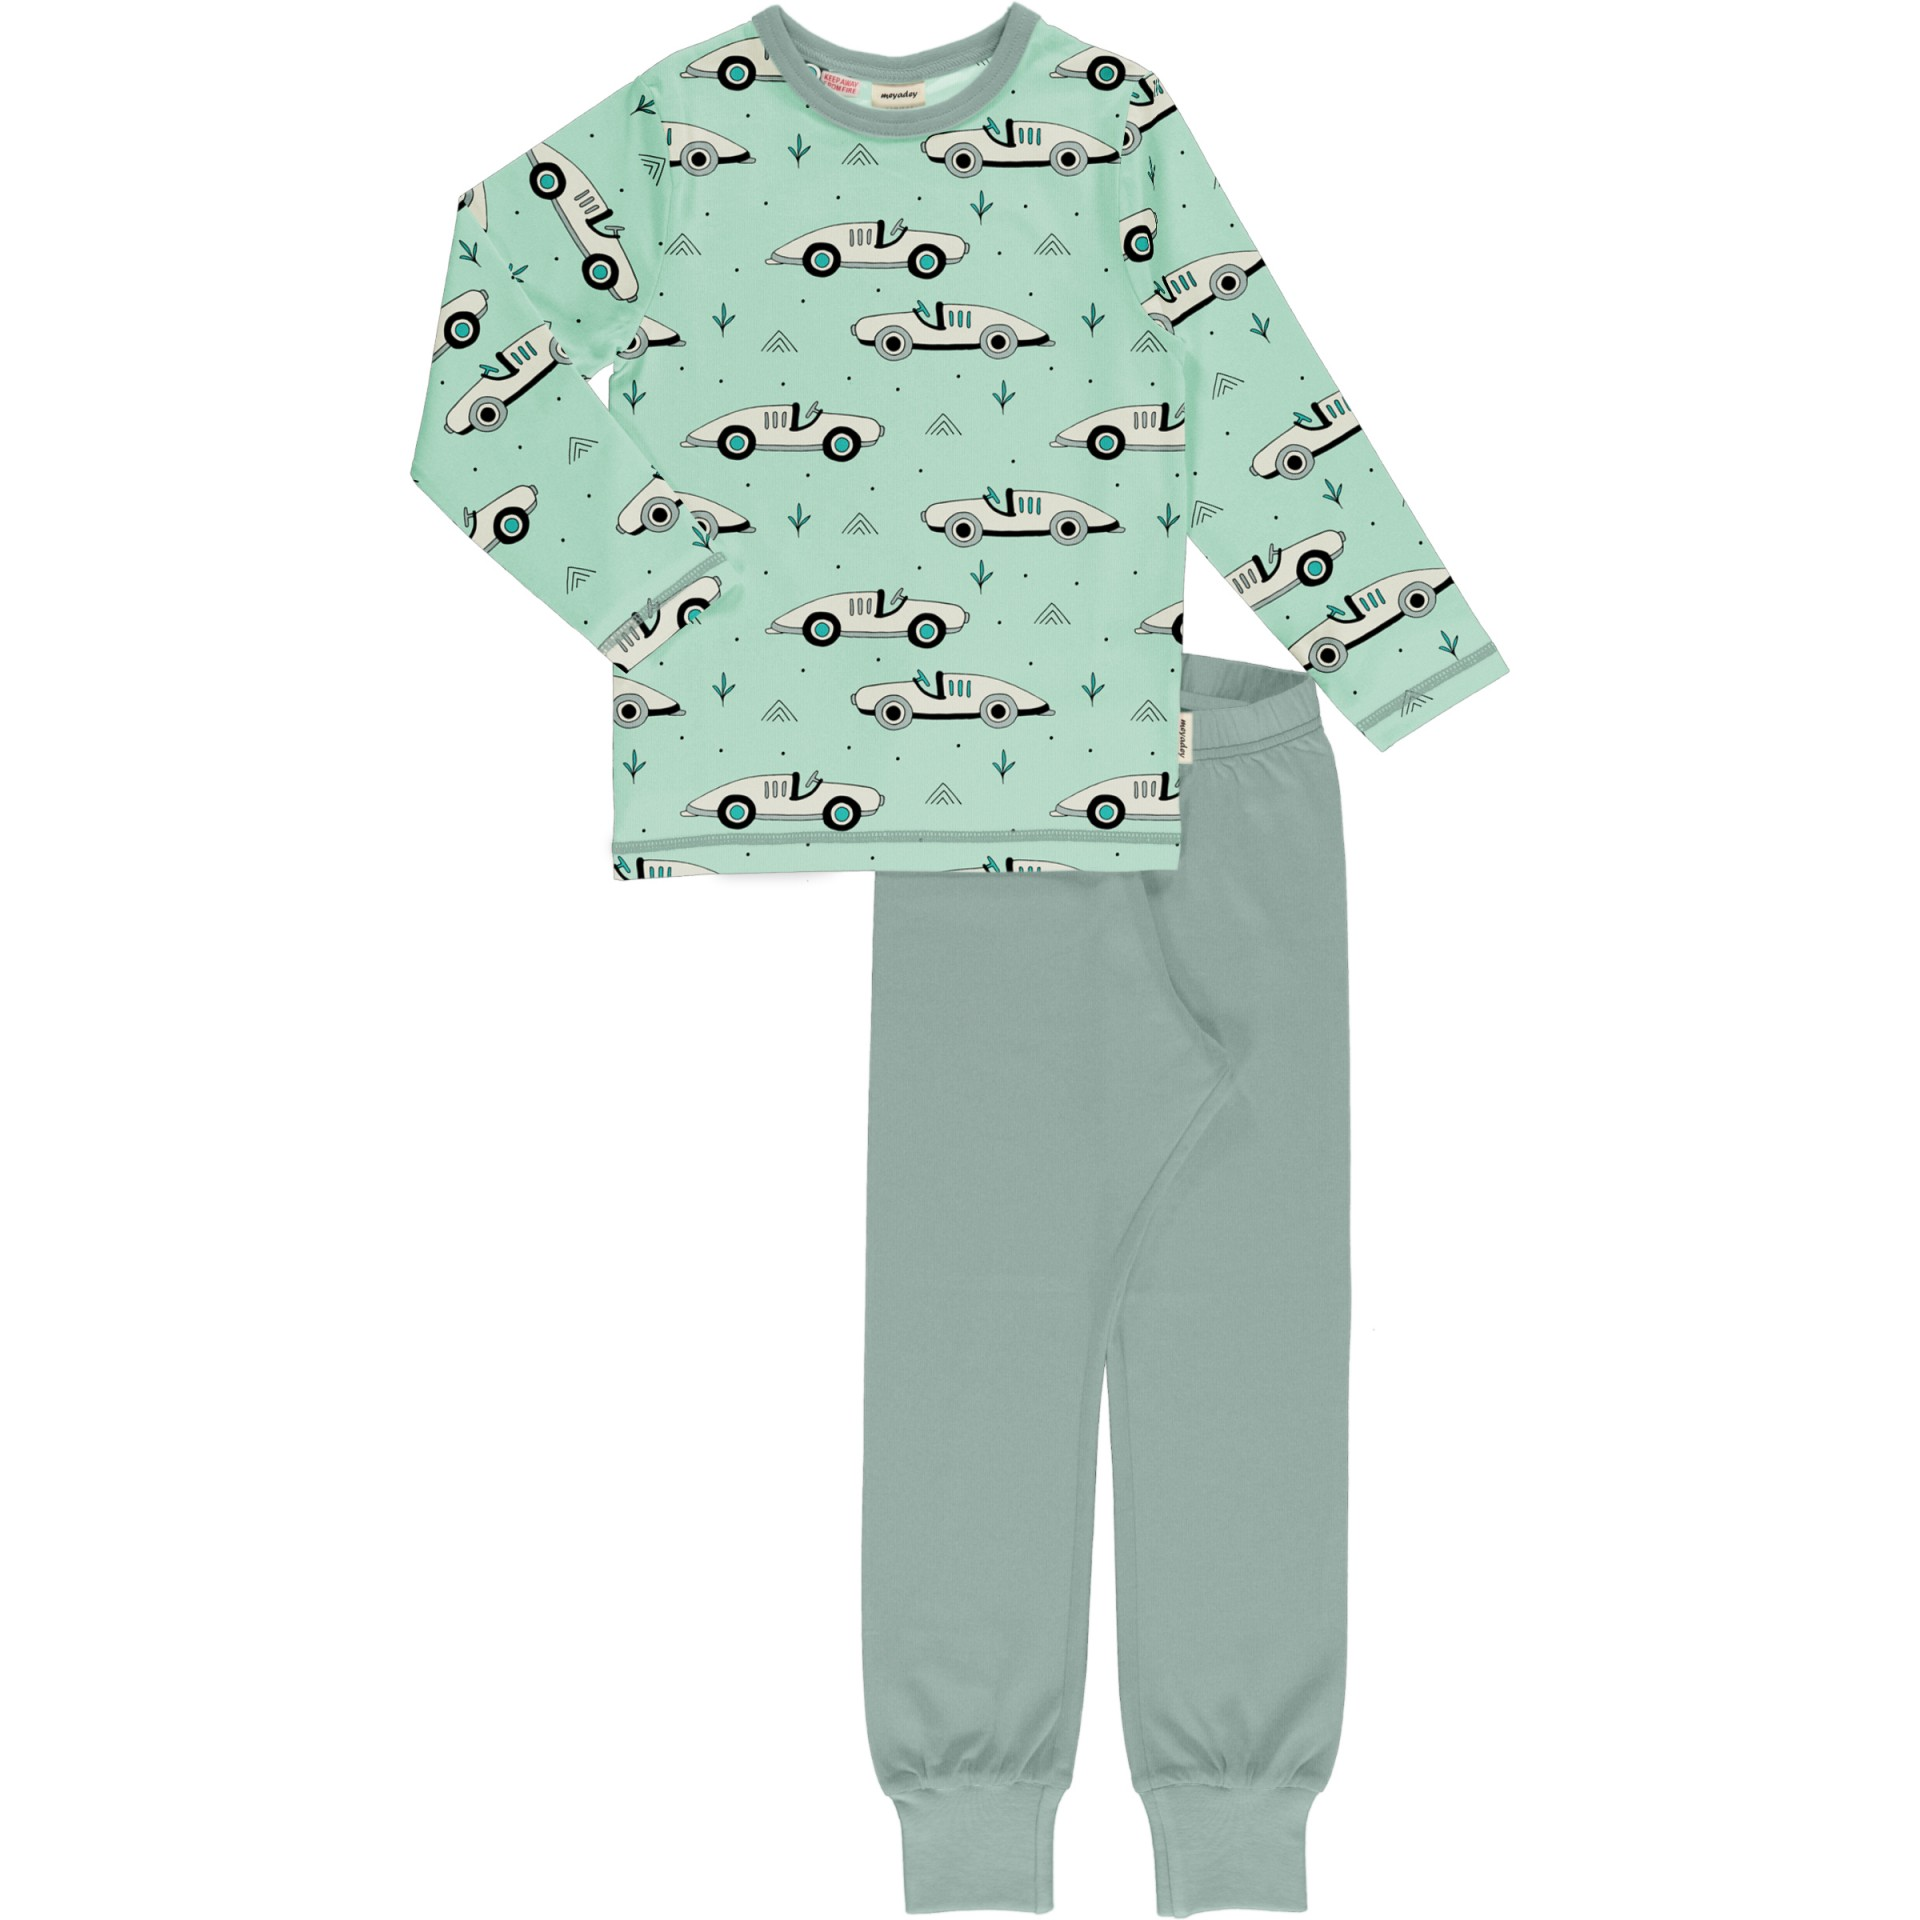 Pijama Race Cars Meyaday (Tamanhos disponíveis 18-24m, 3-4a, 5-6a, 9-10a)